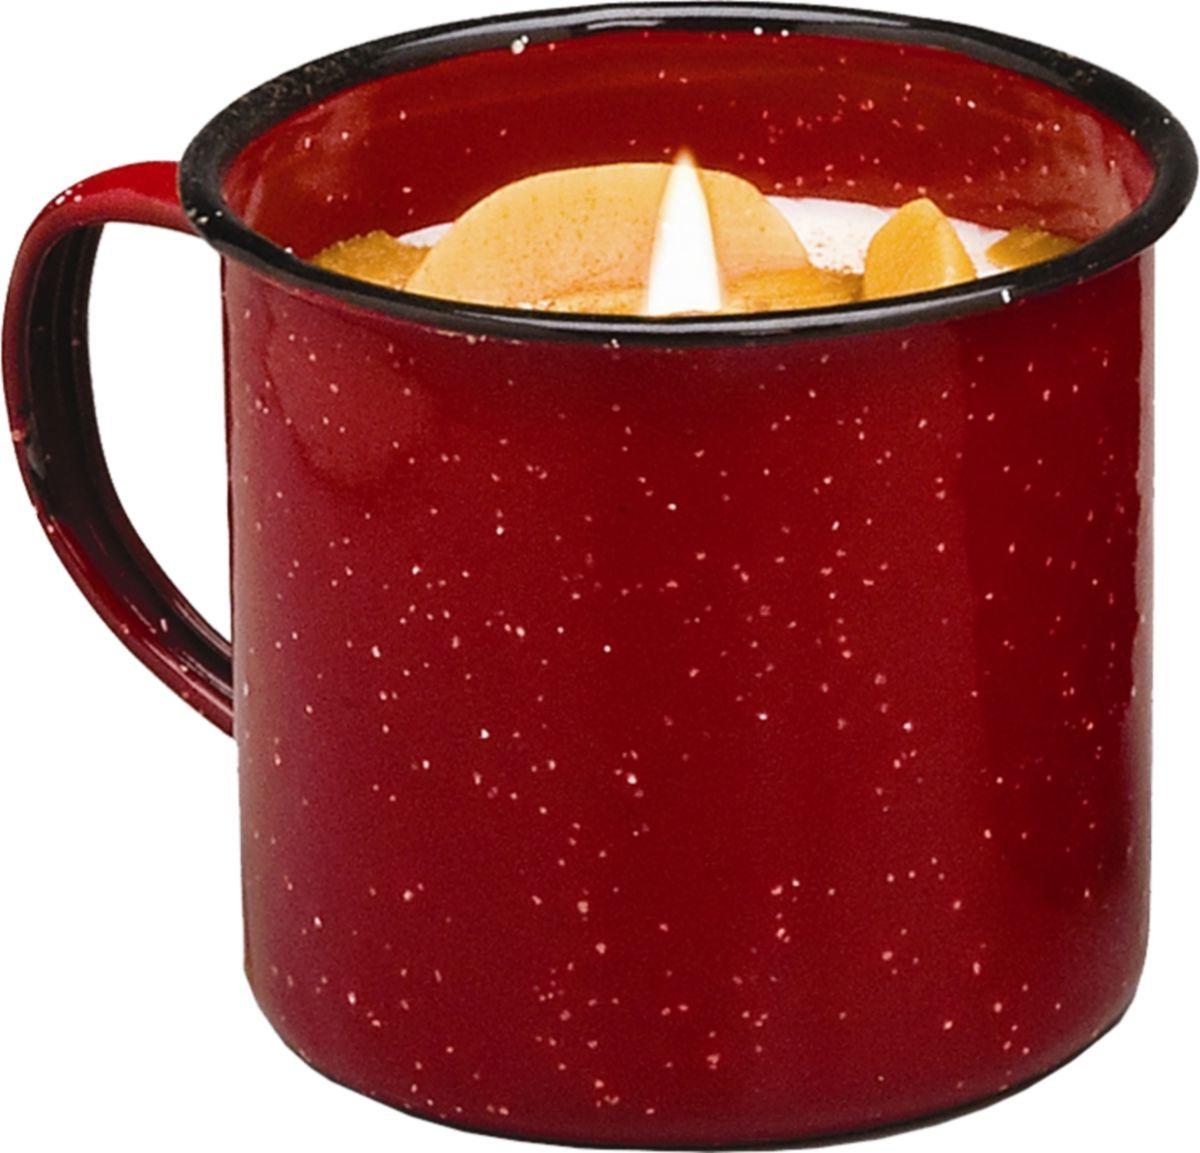 Swan Creek Candle Co.® Vintage Enamelware Mug Candles